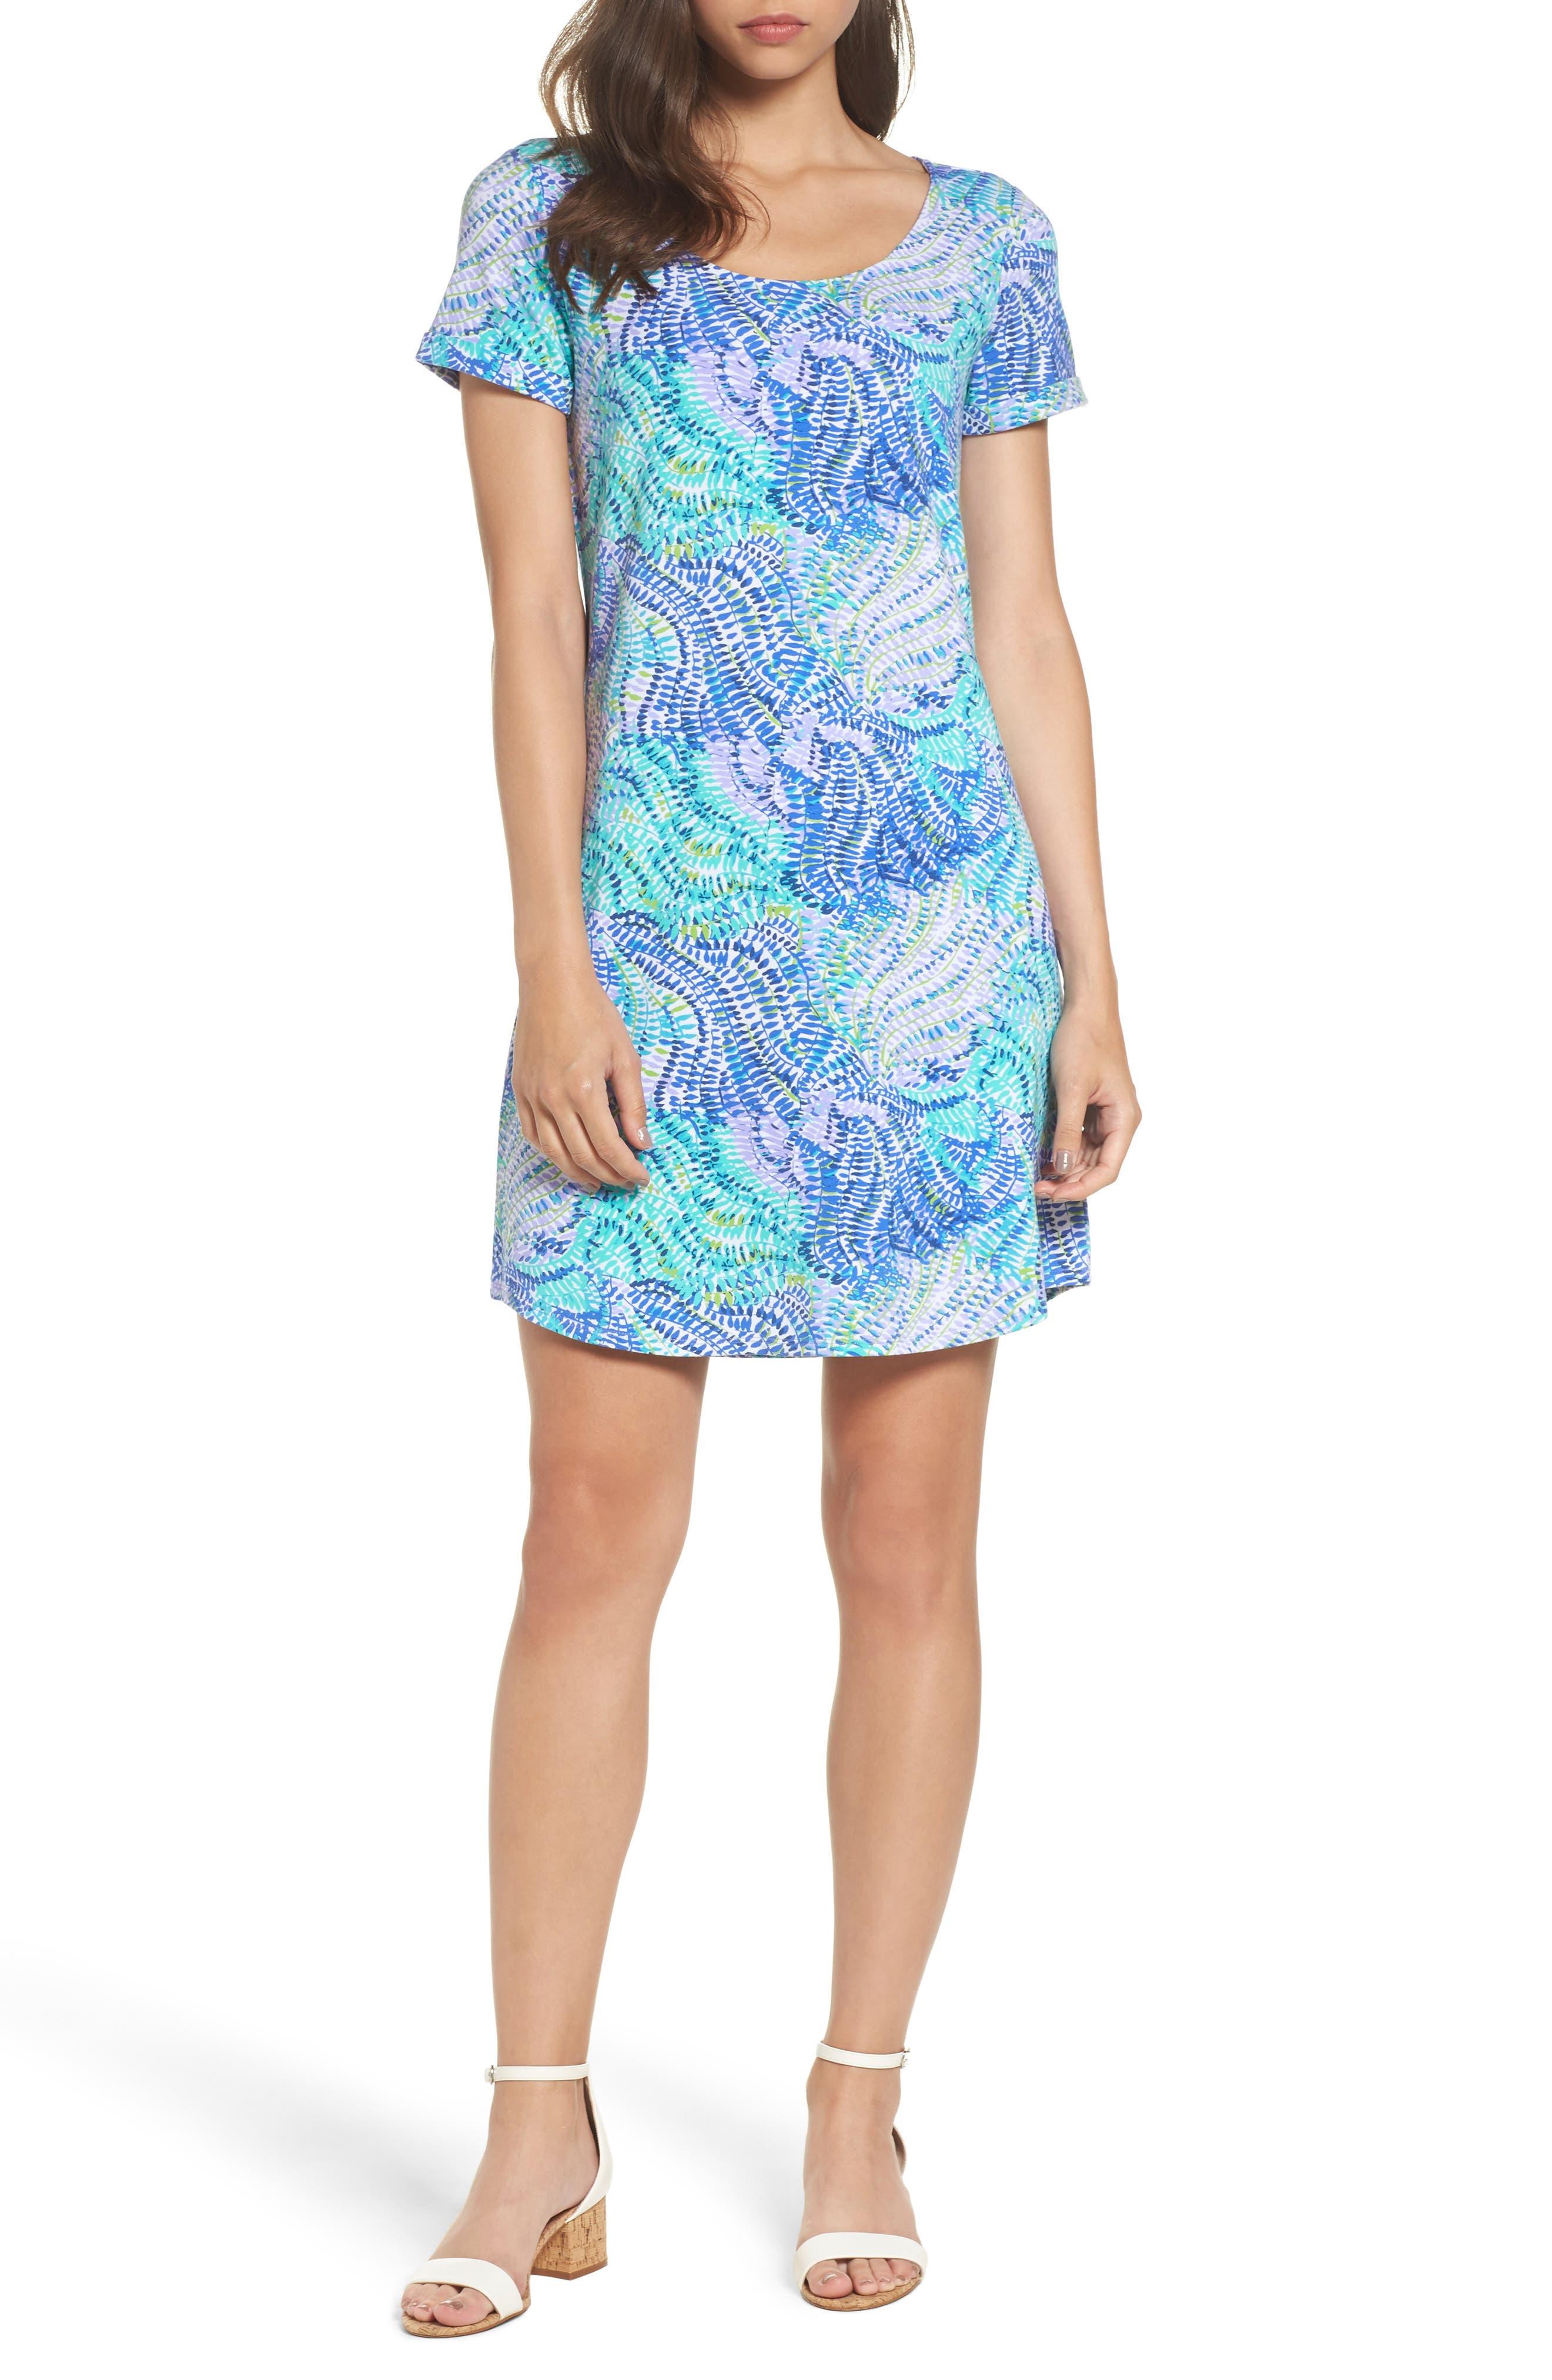 Main Image - Lilly Pulitzer® Tammy UPF 50 Dress